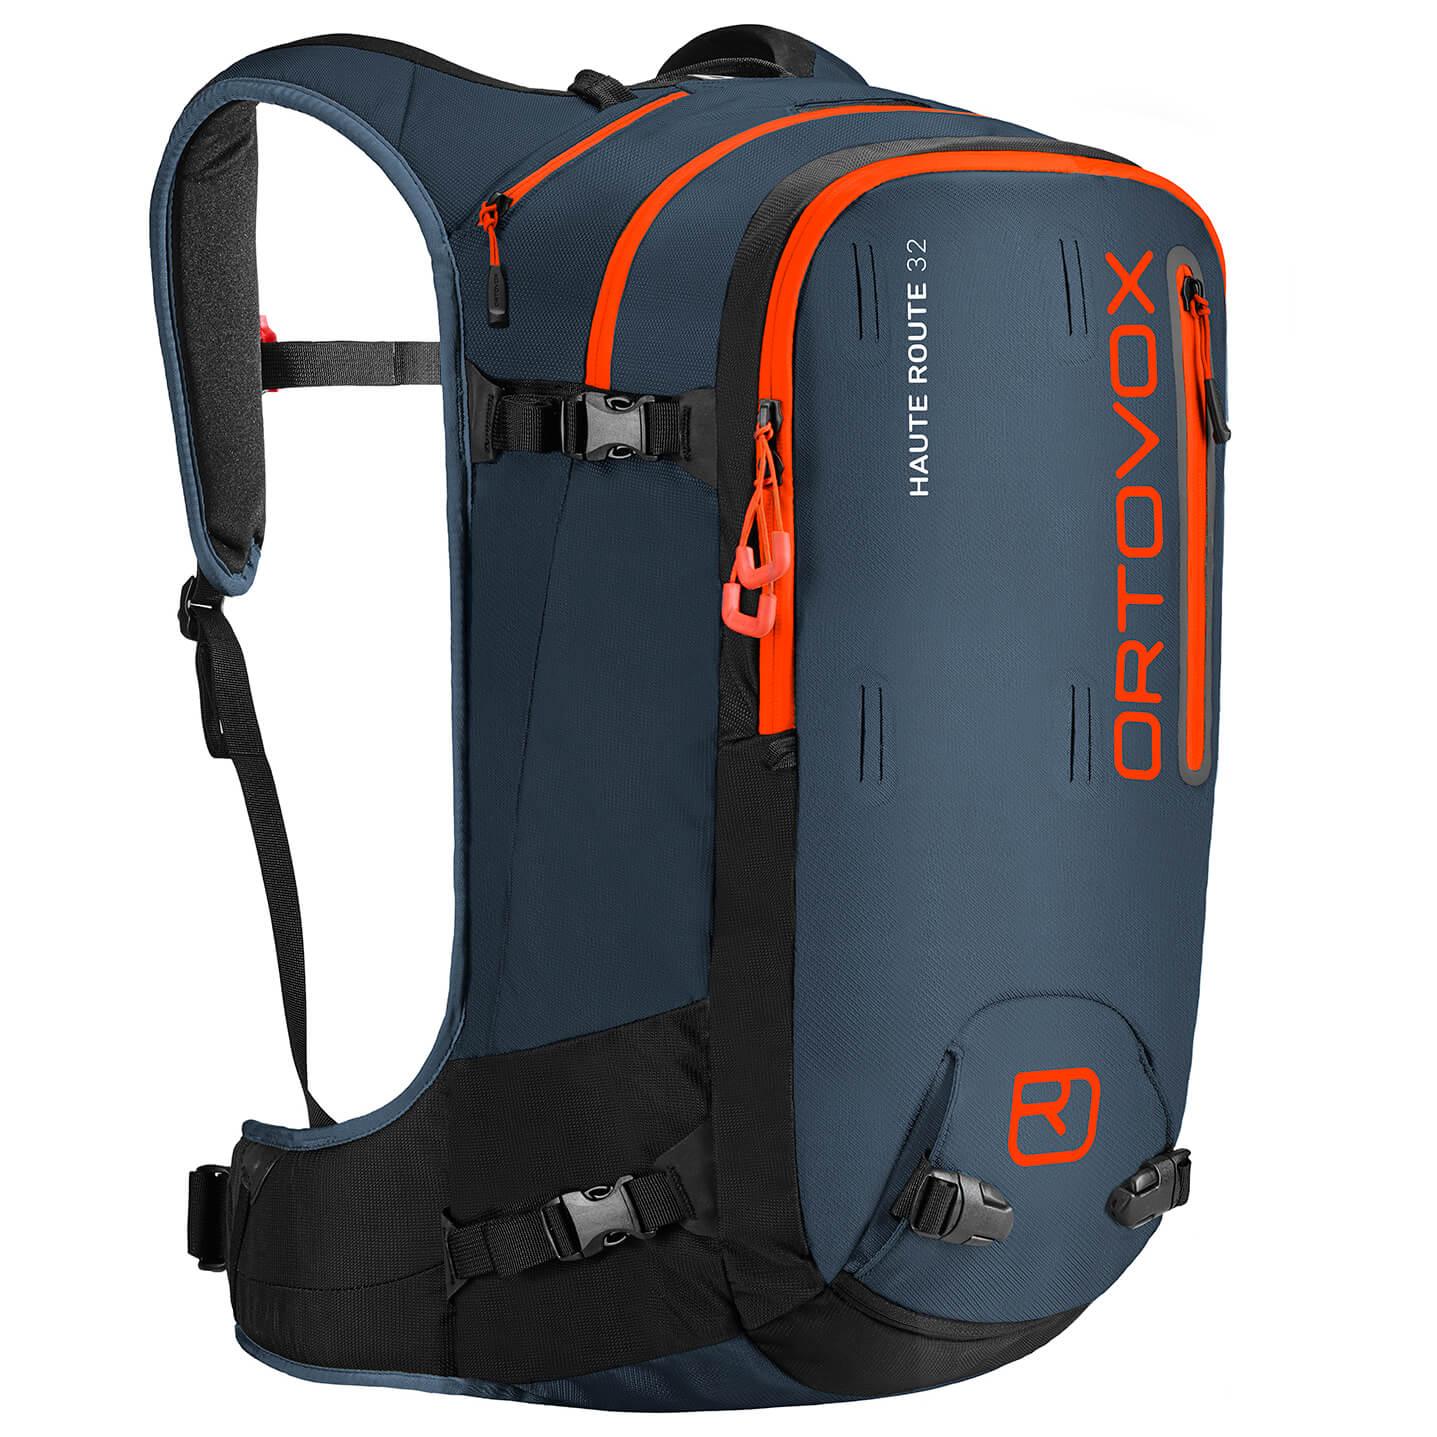 c3cf69cd05 Ortovox Haute Route 32 - Ski Touring Backpack